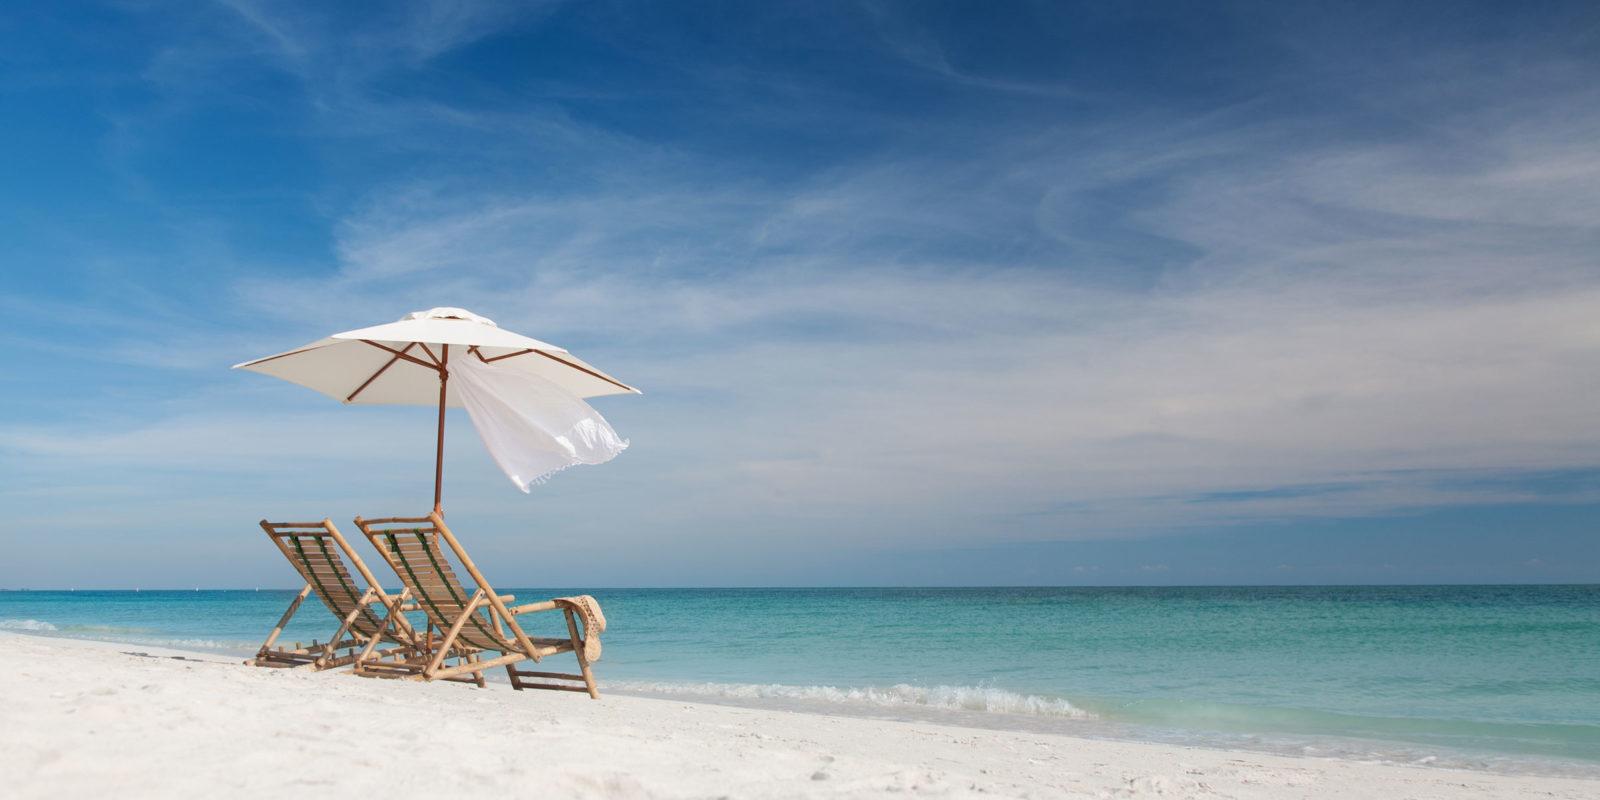 Marco Island Vacation Club